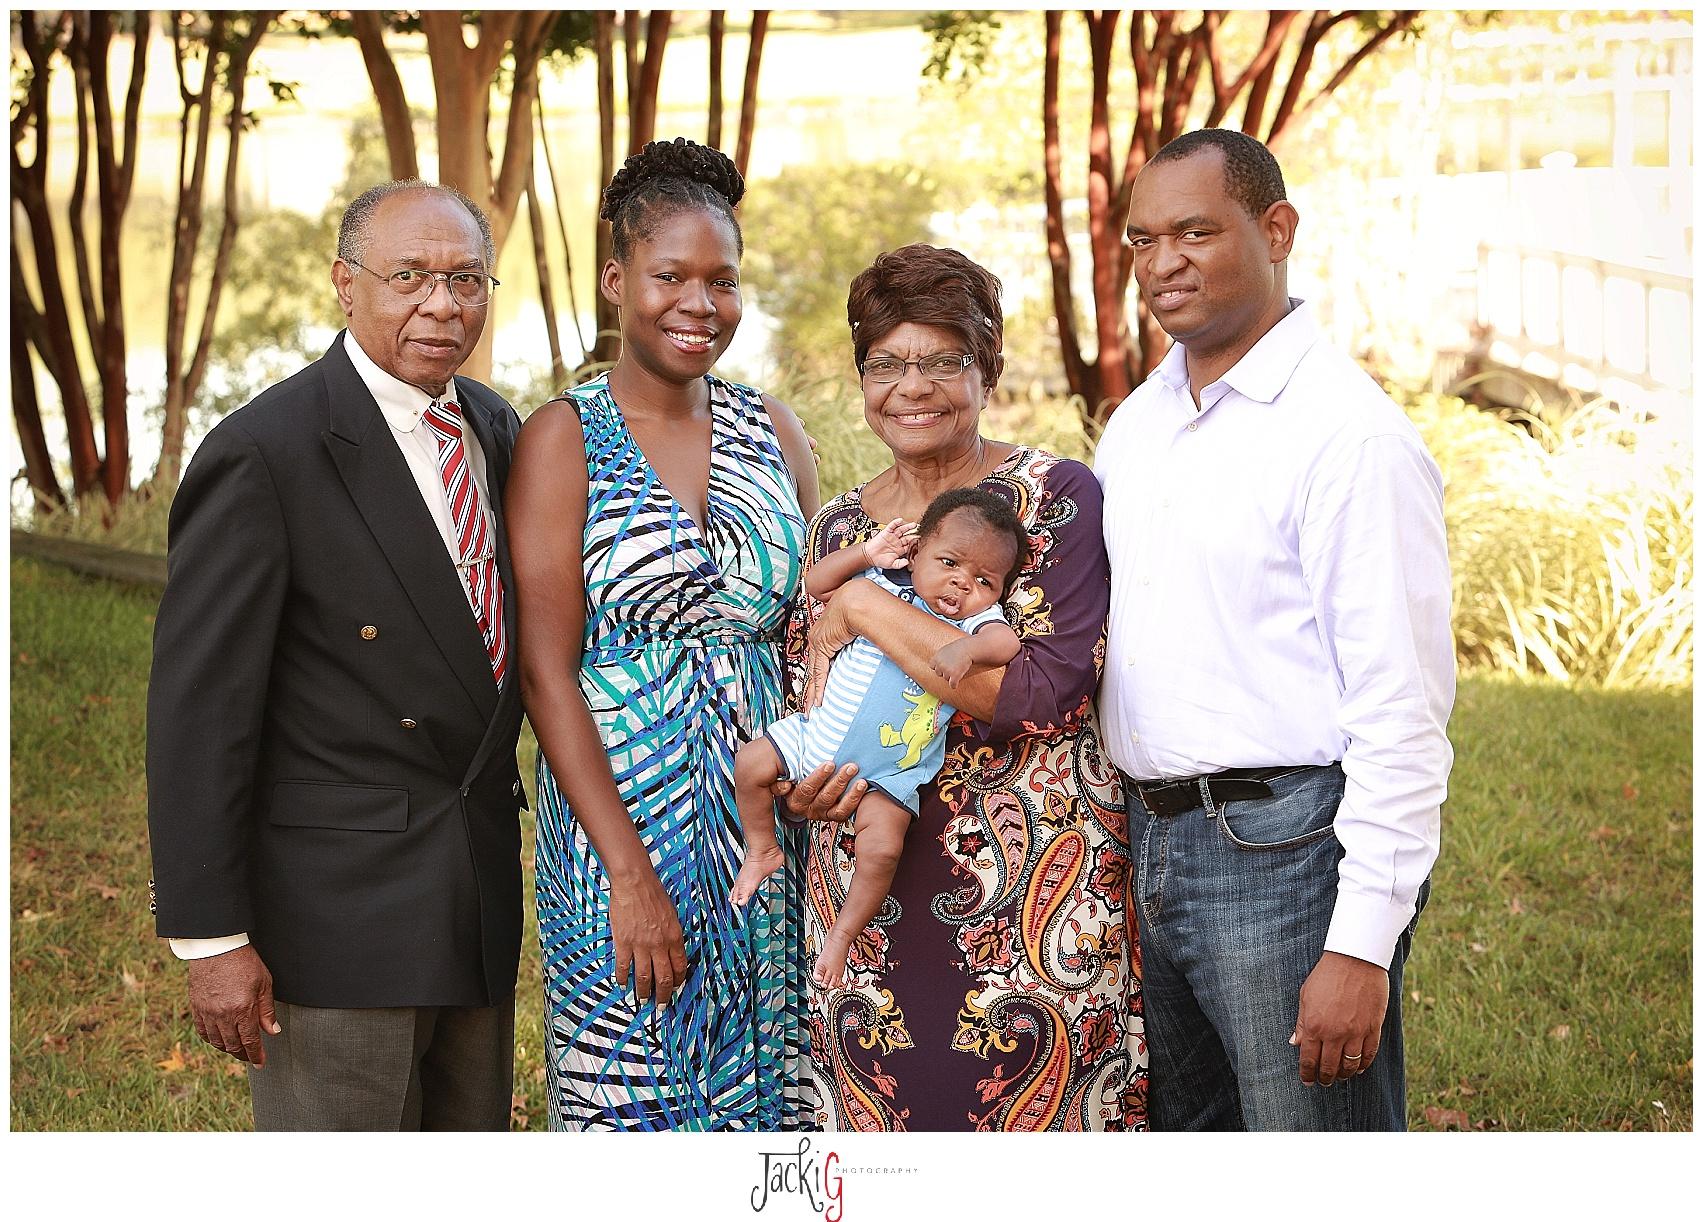 #family #richmondphotography